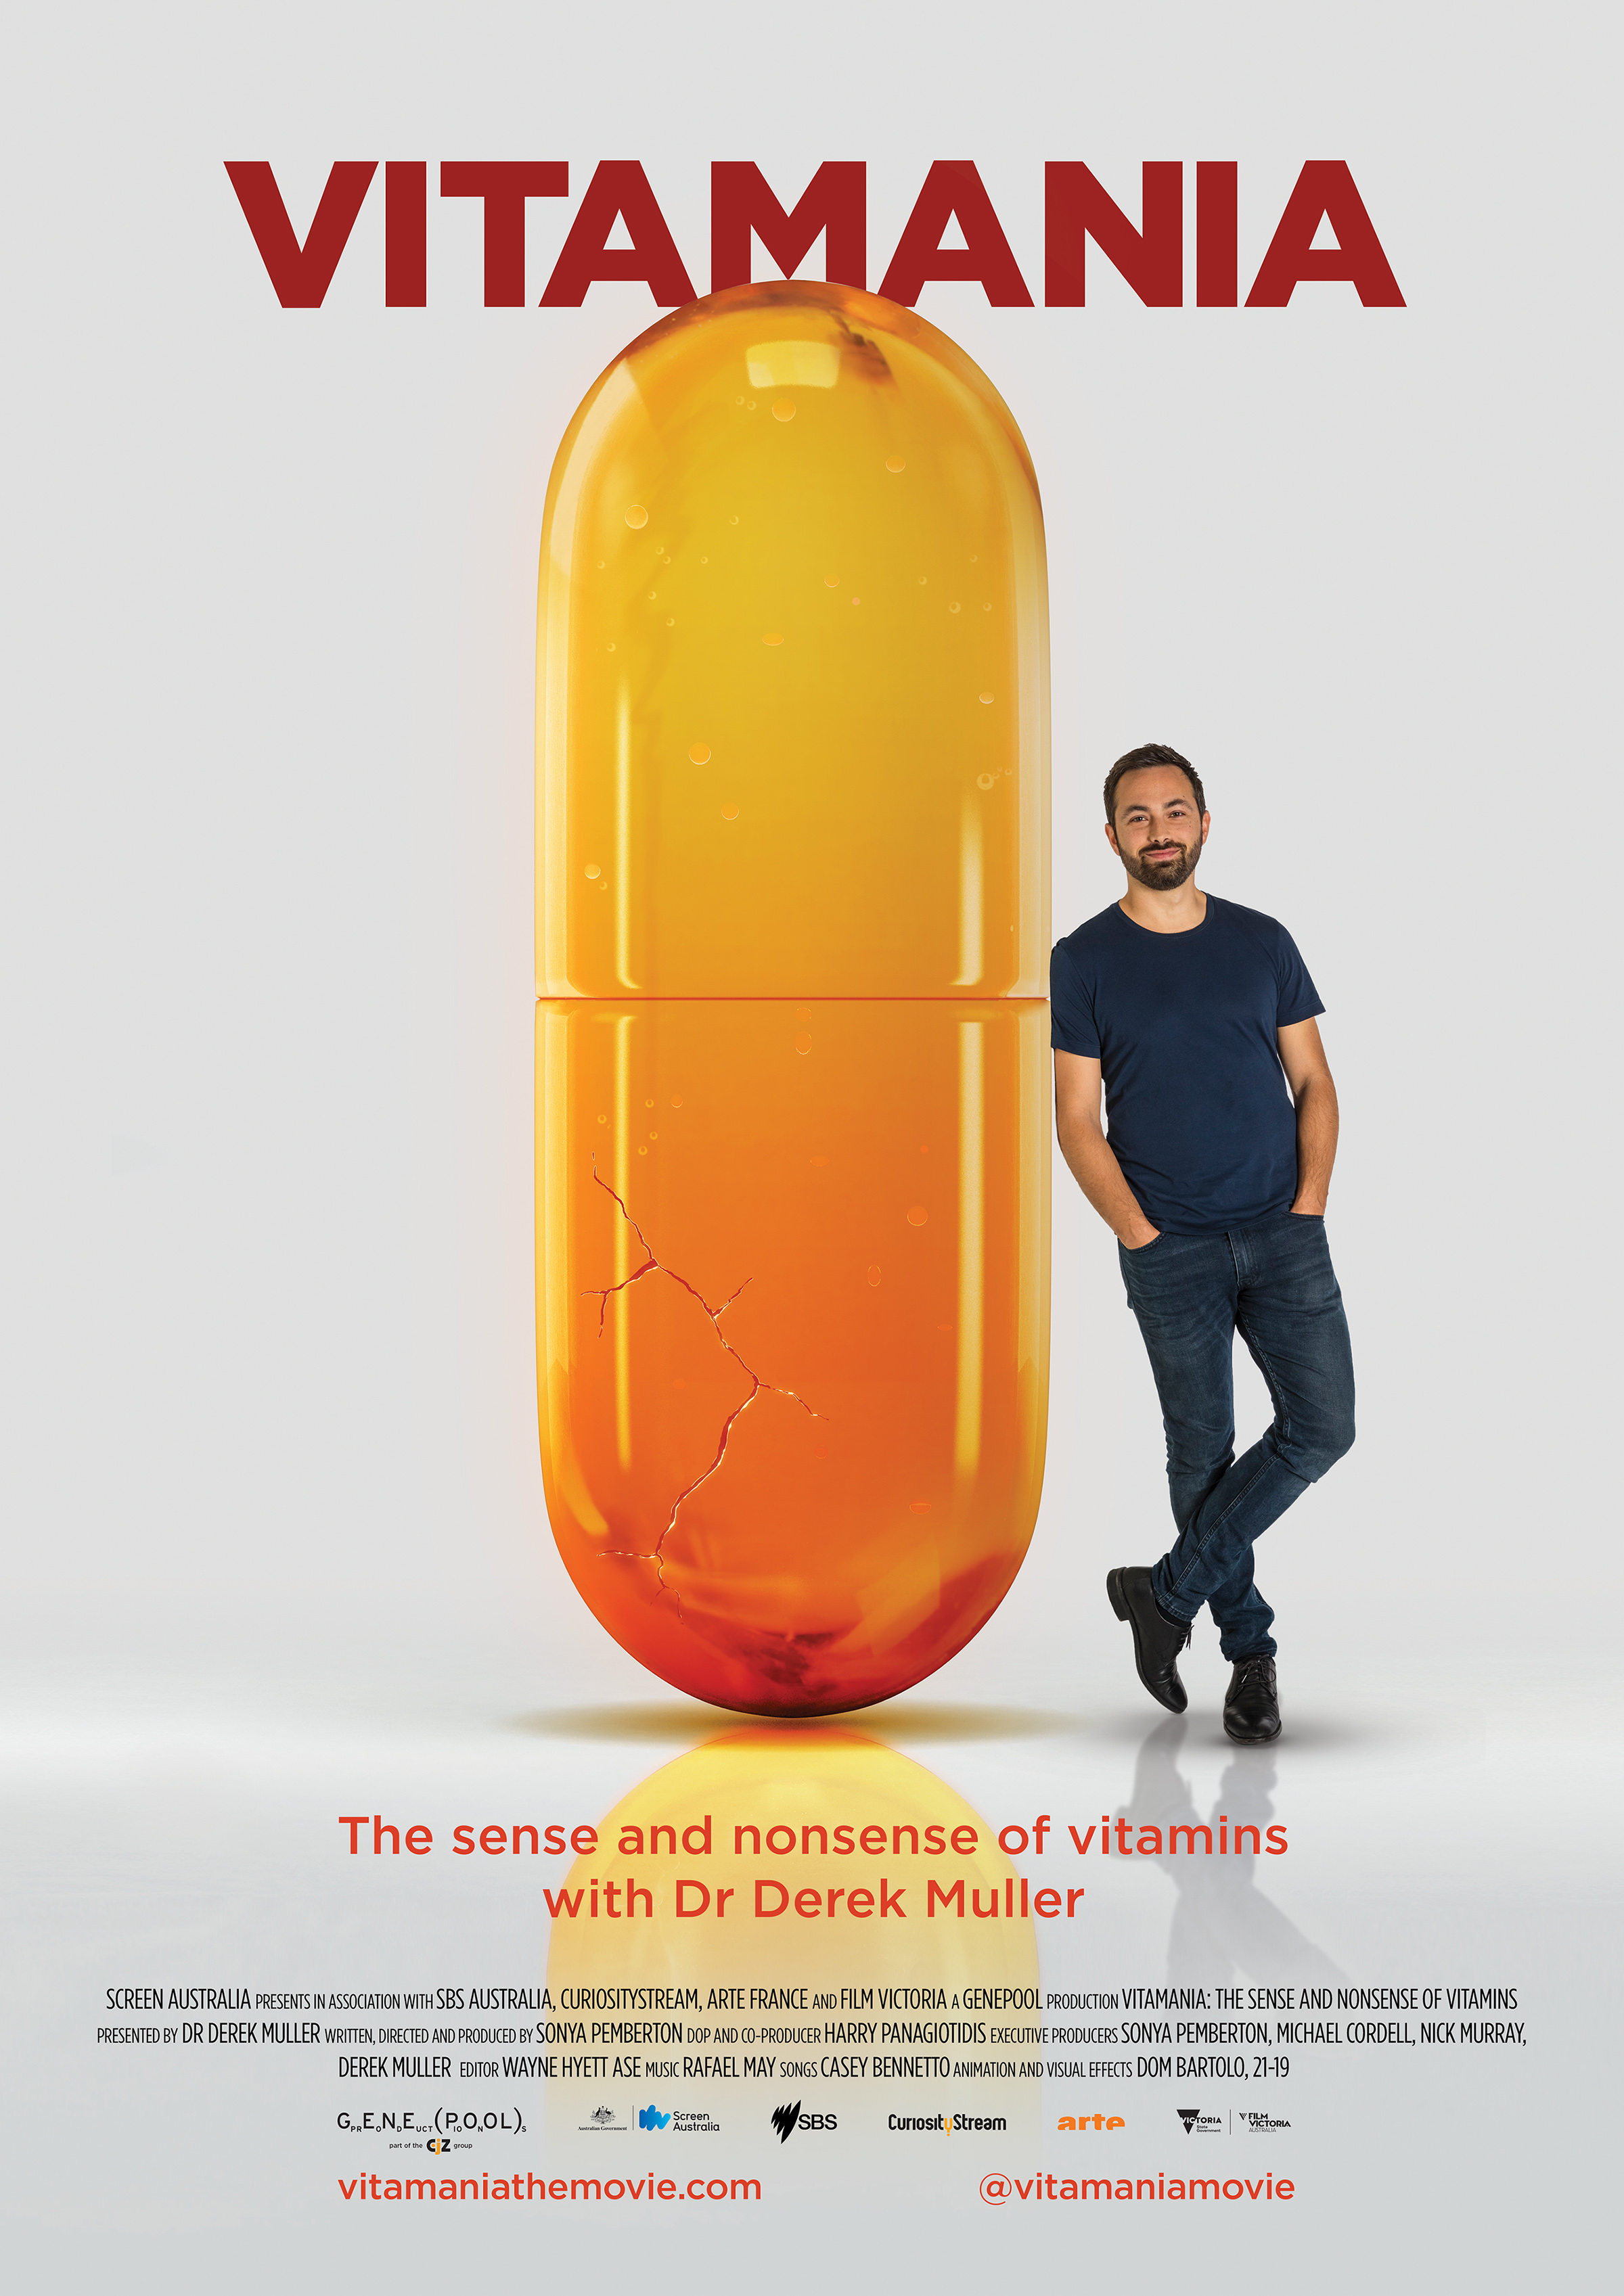 Vitamania - The Sense and Nonsense of Vitamins